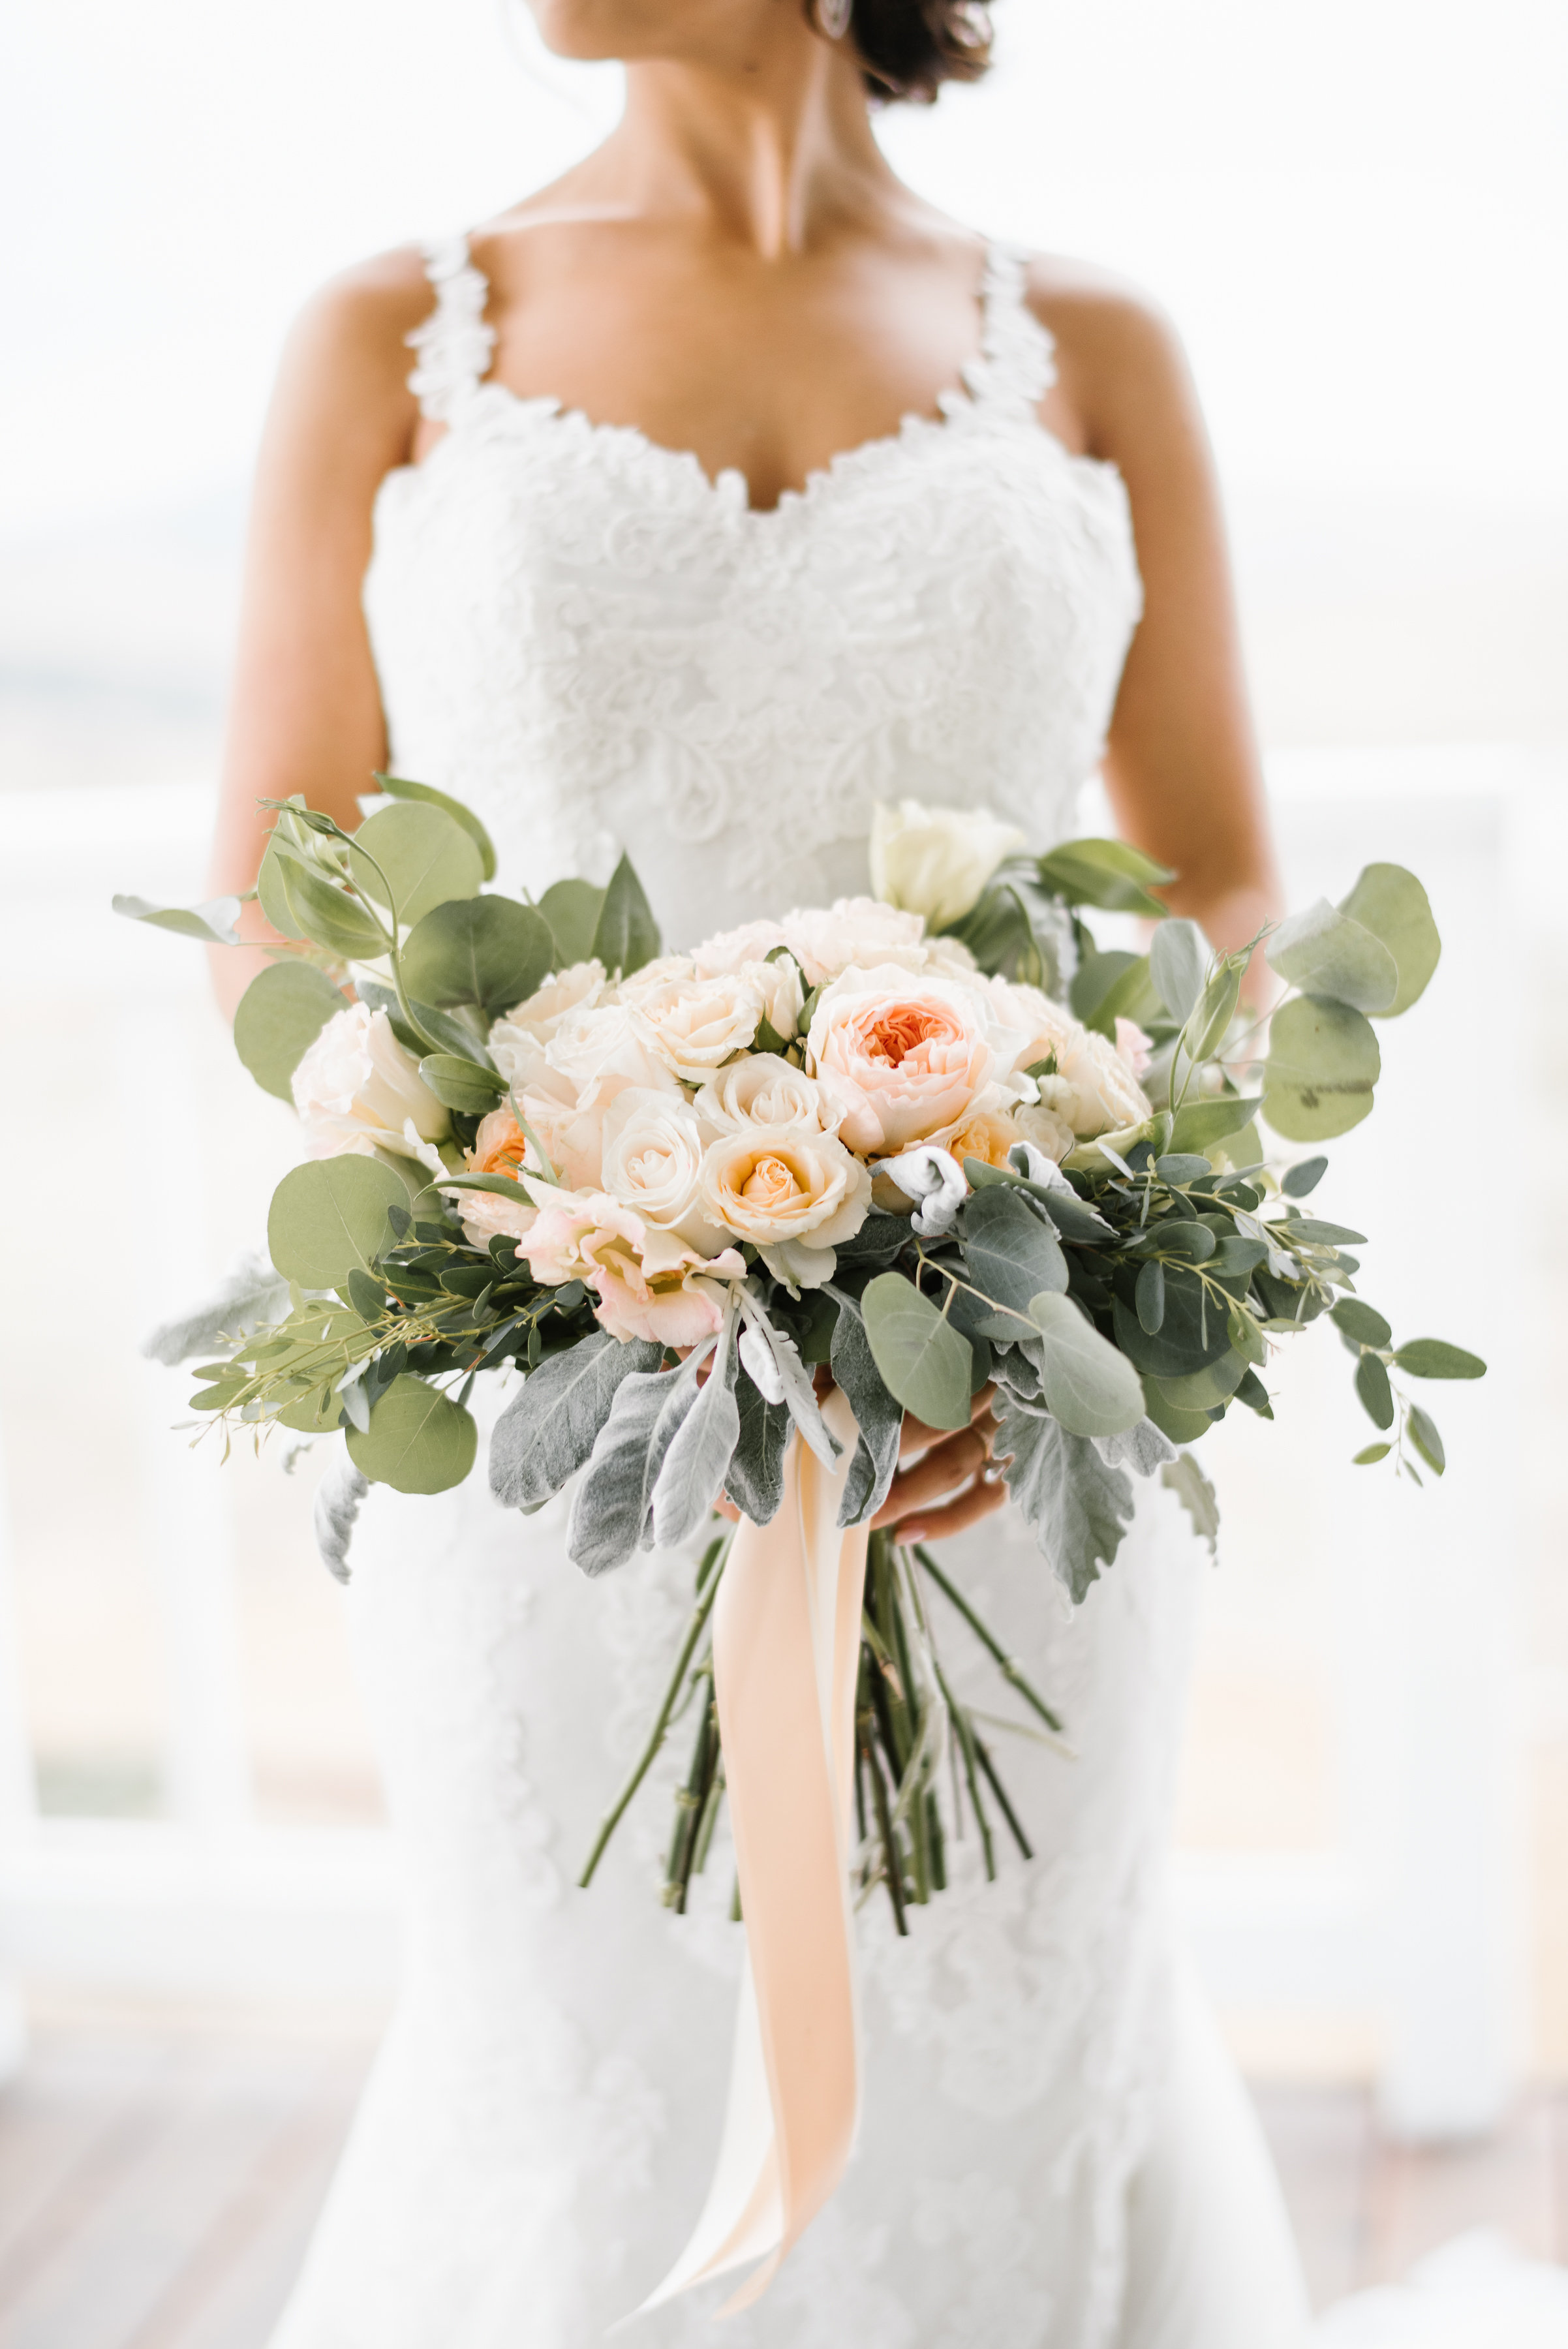 Rachel-Michael-Diaz-Wedding-220.jpg